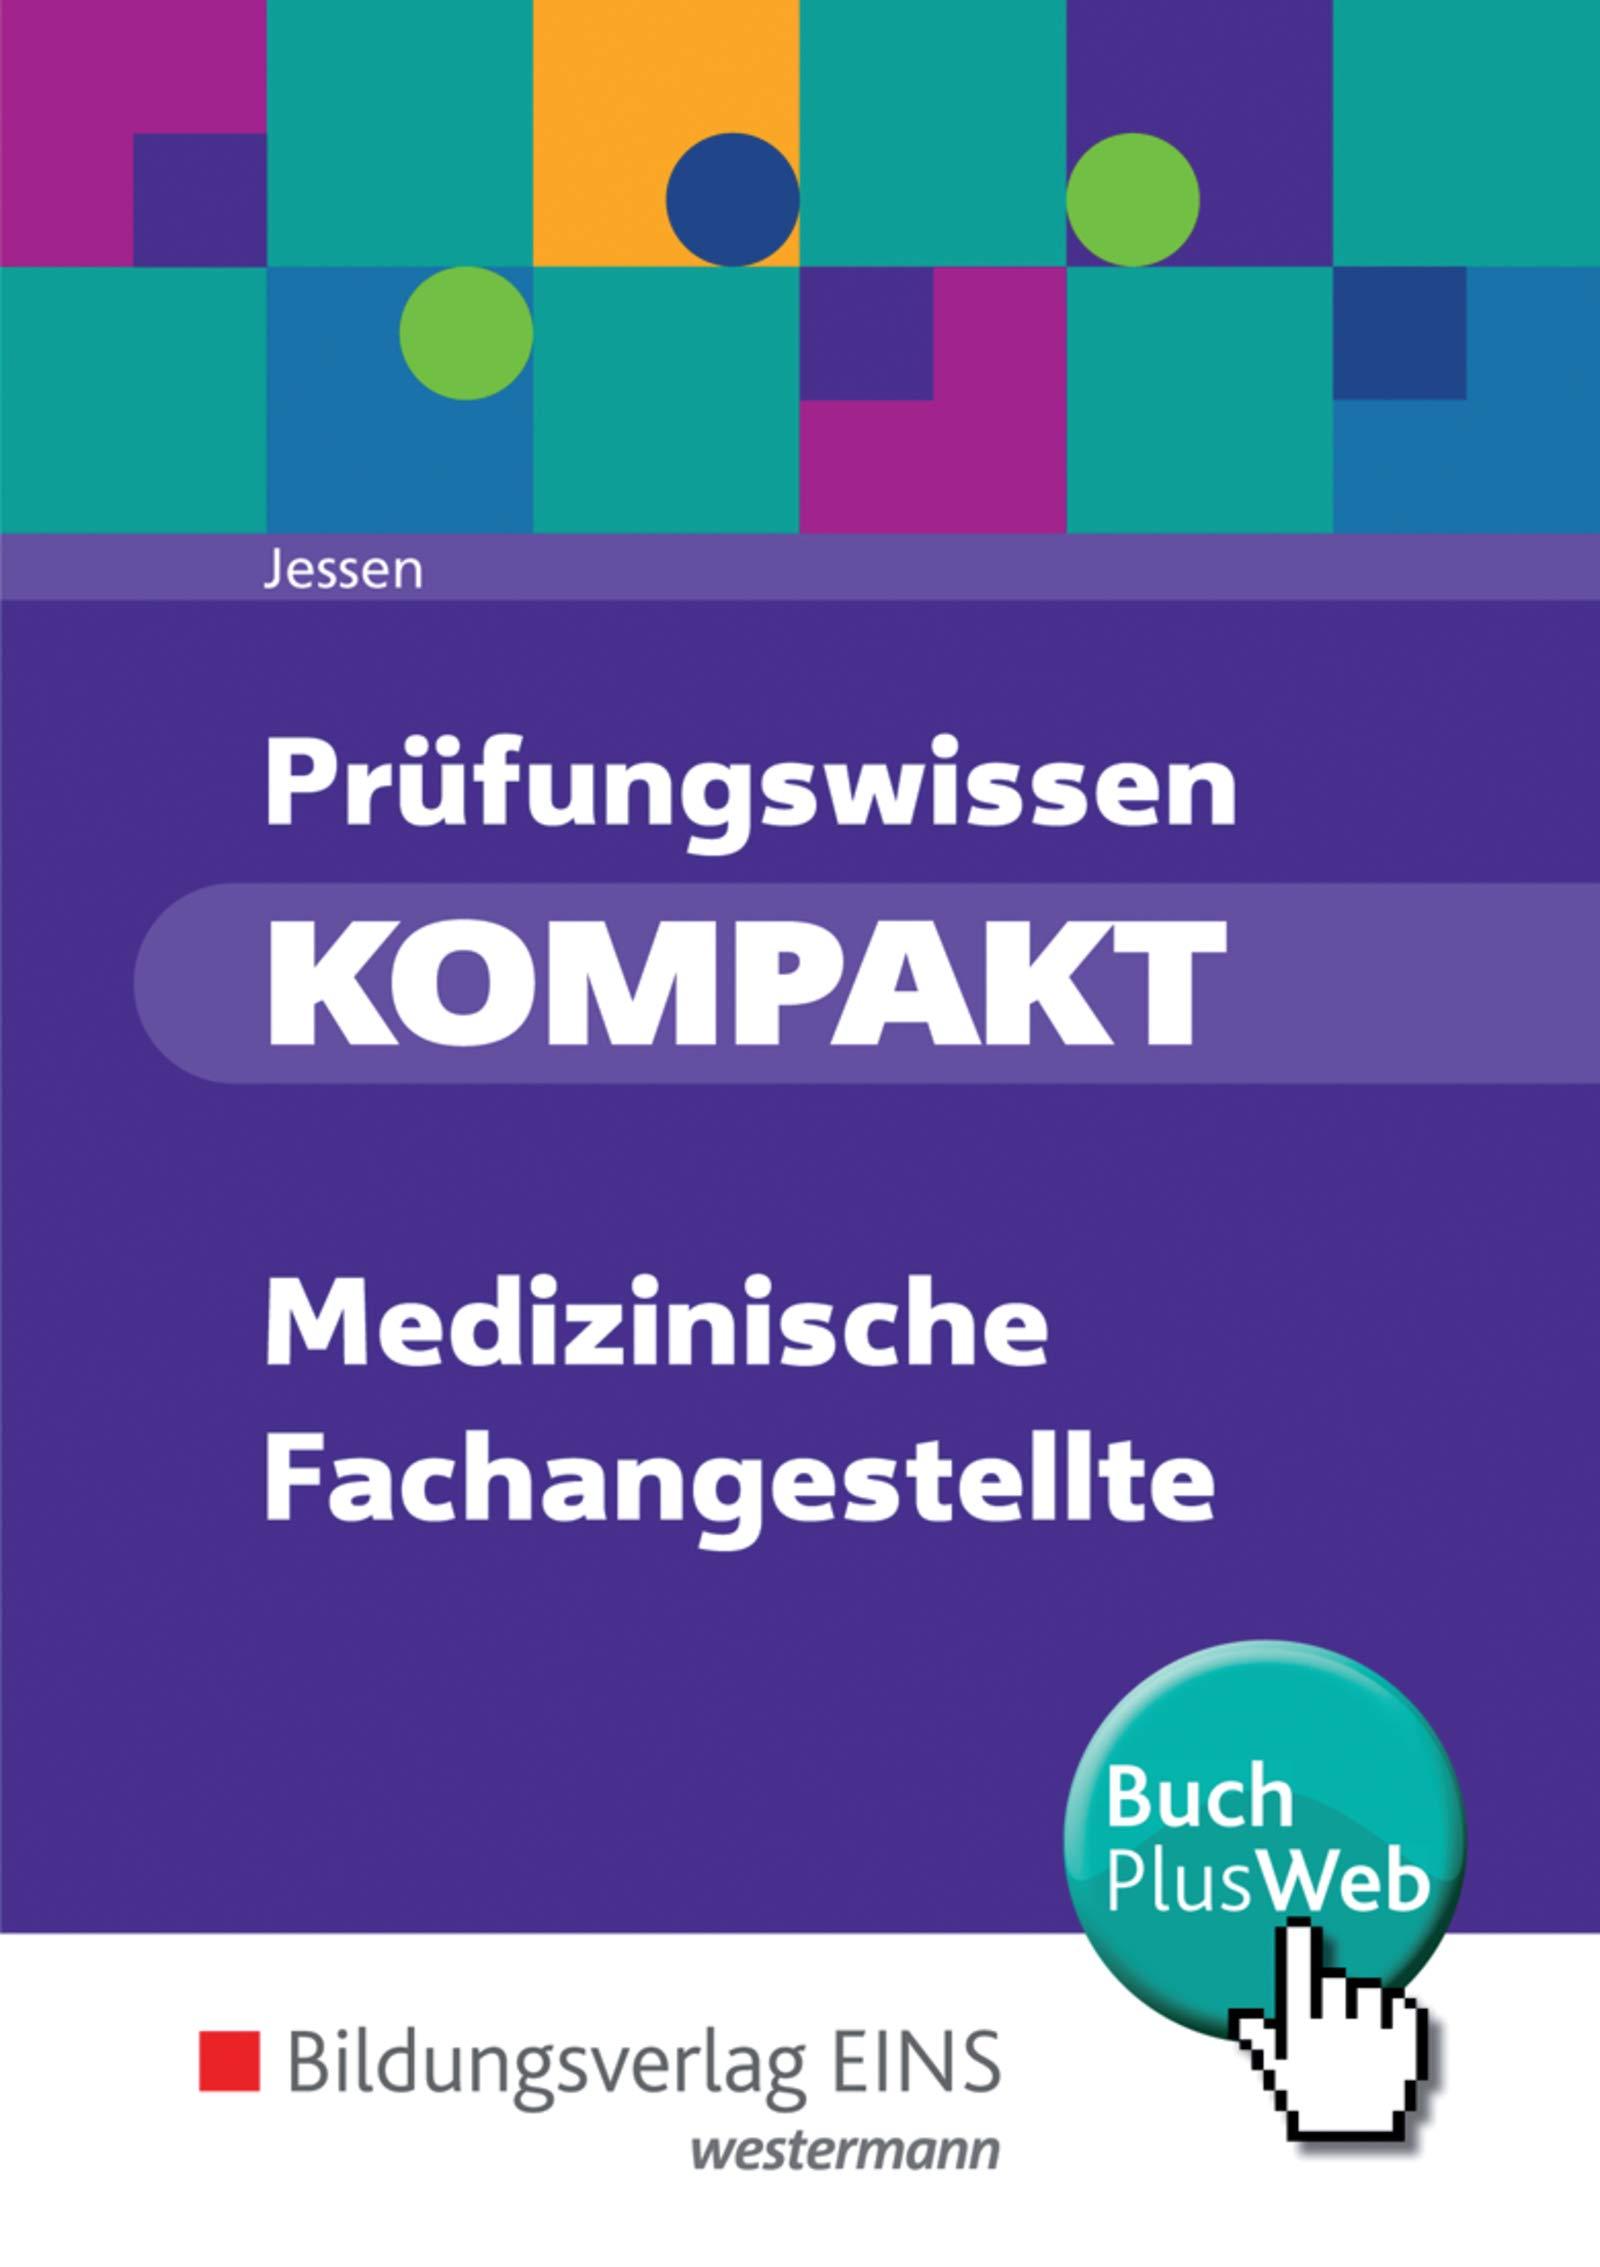 Prufungswissen Kompakt Medizinische Fachangestellte Schulerband Amazon De Jessen Andrea Bucher